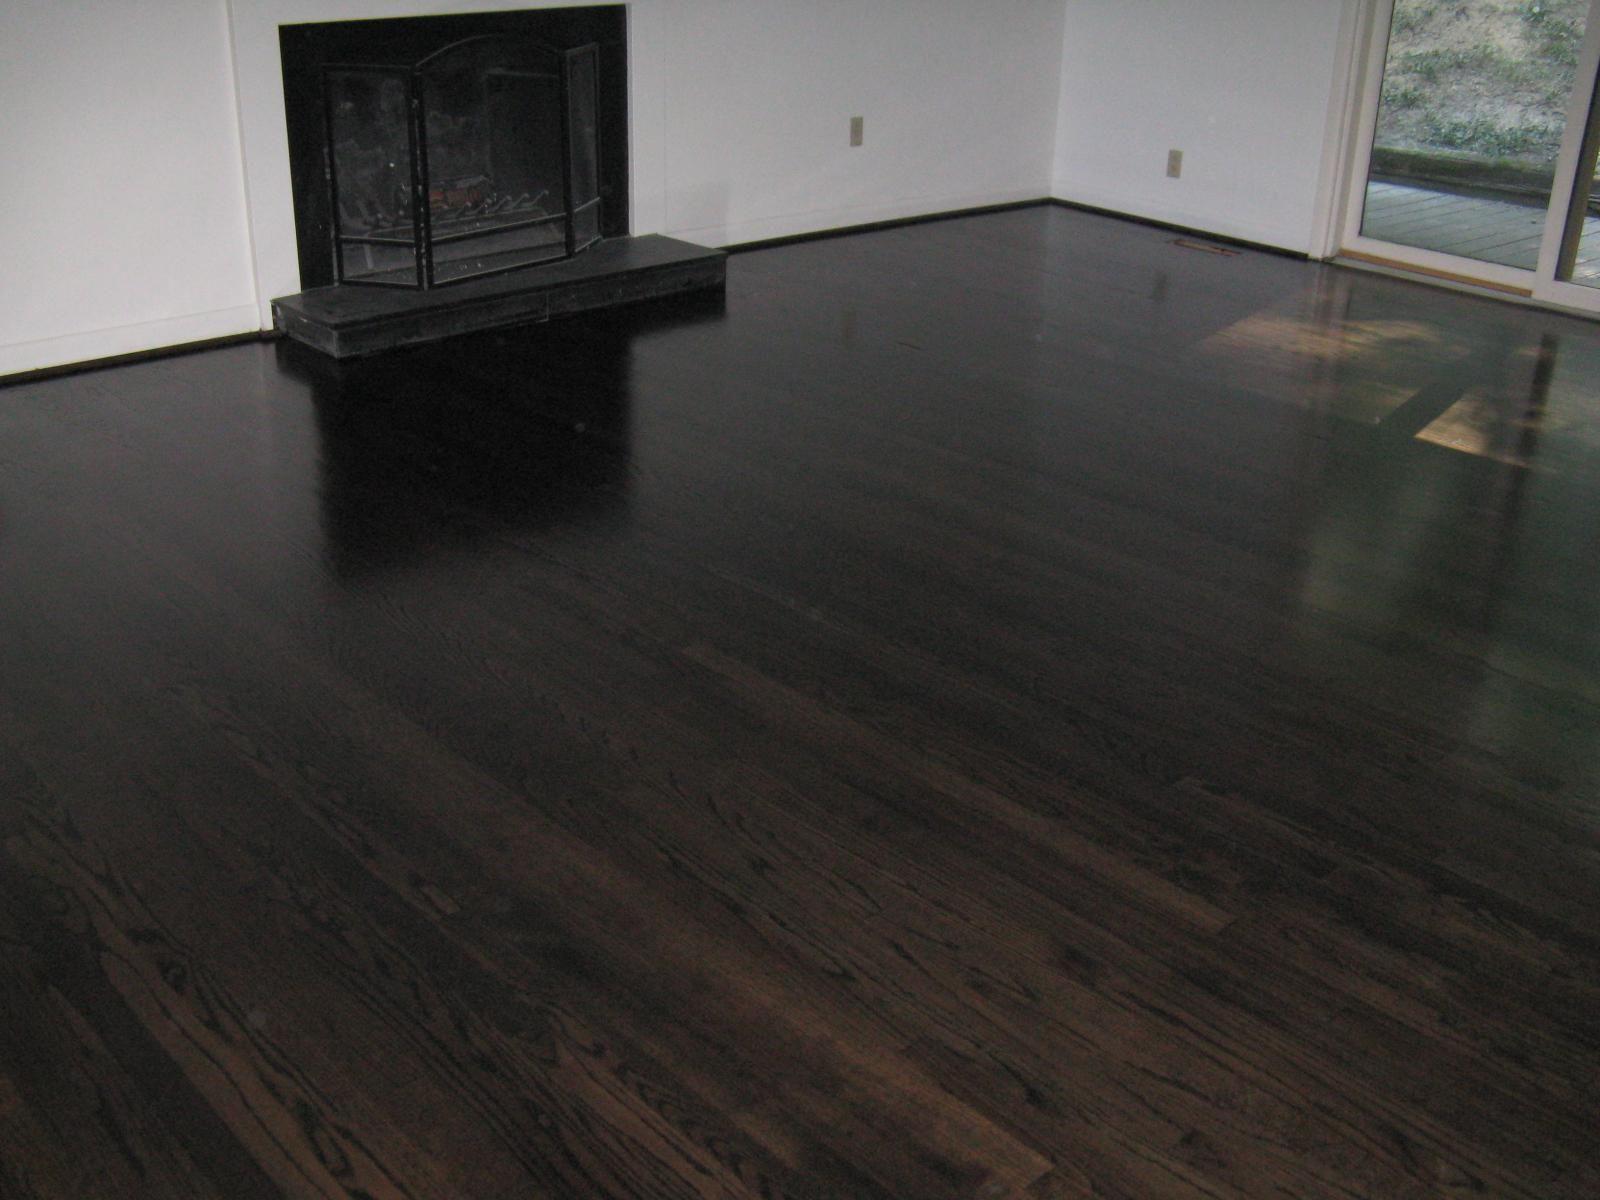 Too darktoo shiny image of hardwood floor stain colors for red oak